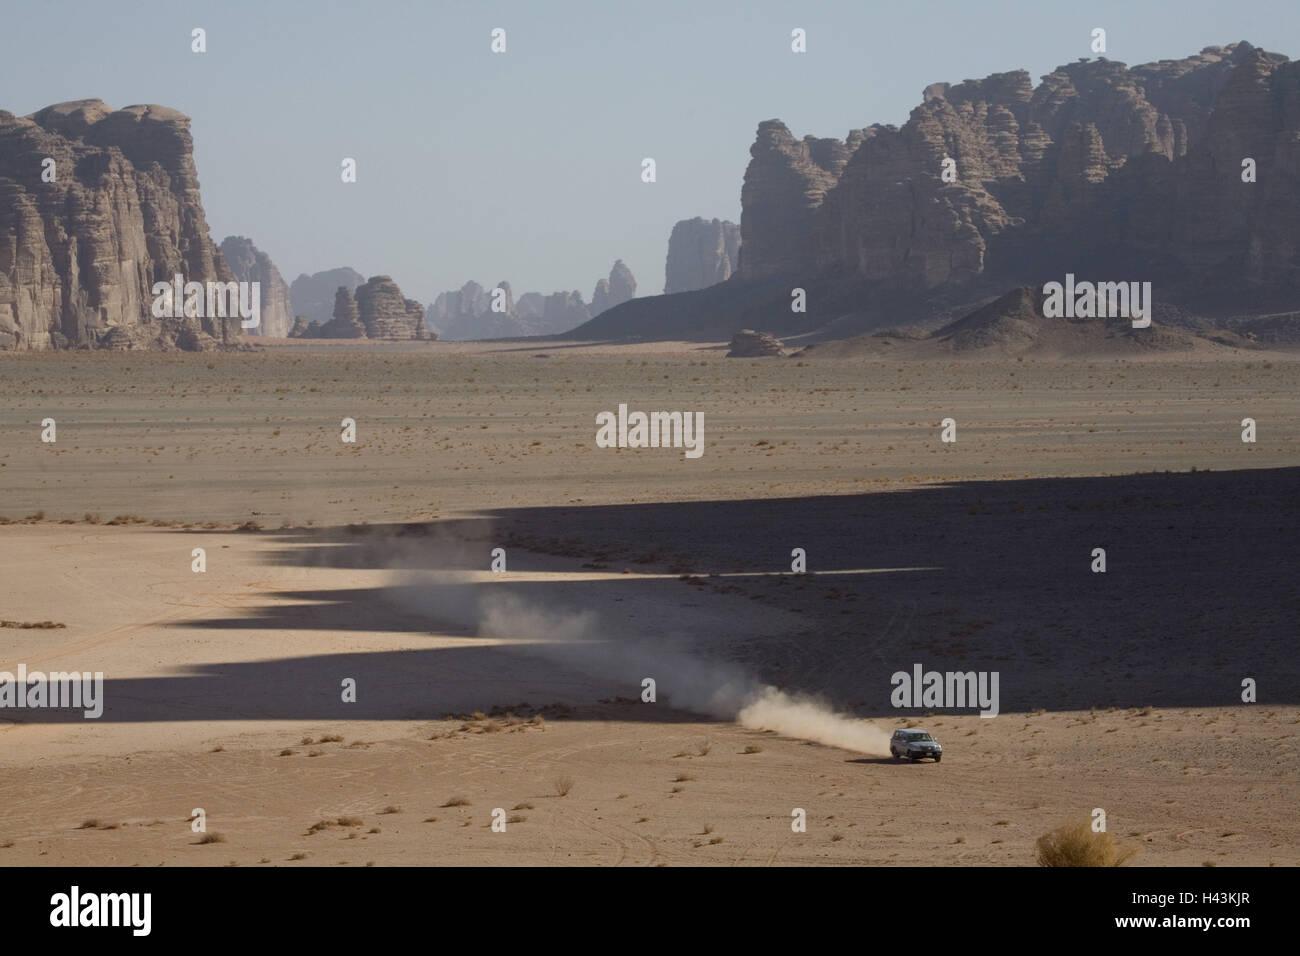 Arabia Saudita, provincia de Tabuk, Hisma-mundial de montañas, desiertos, montañas, jeep Imagen De Stock